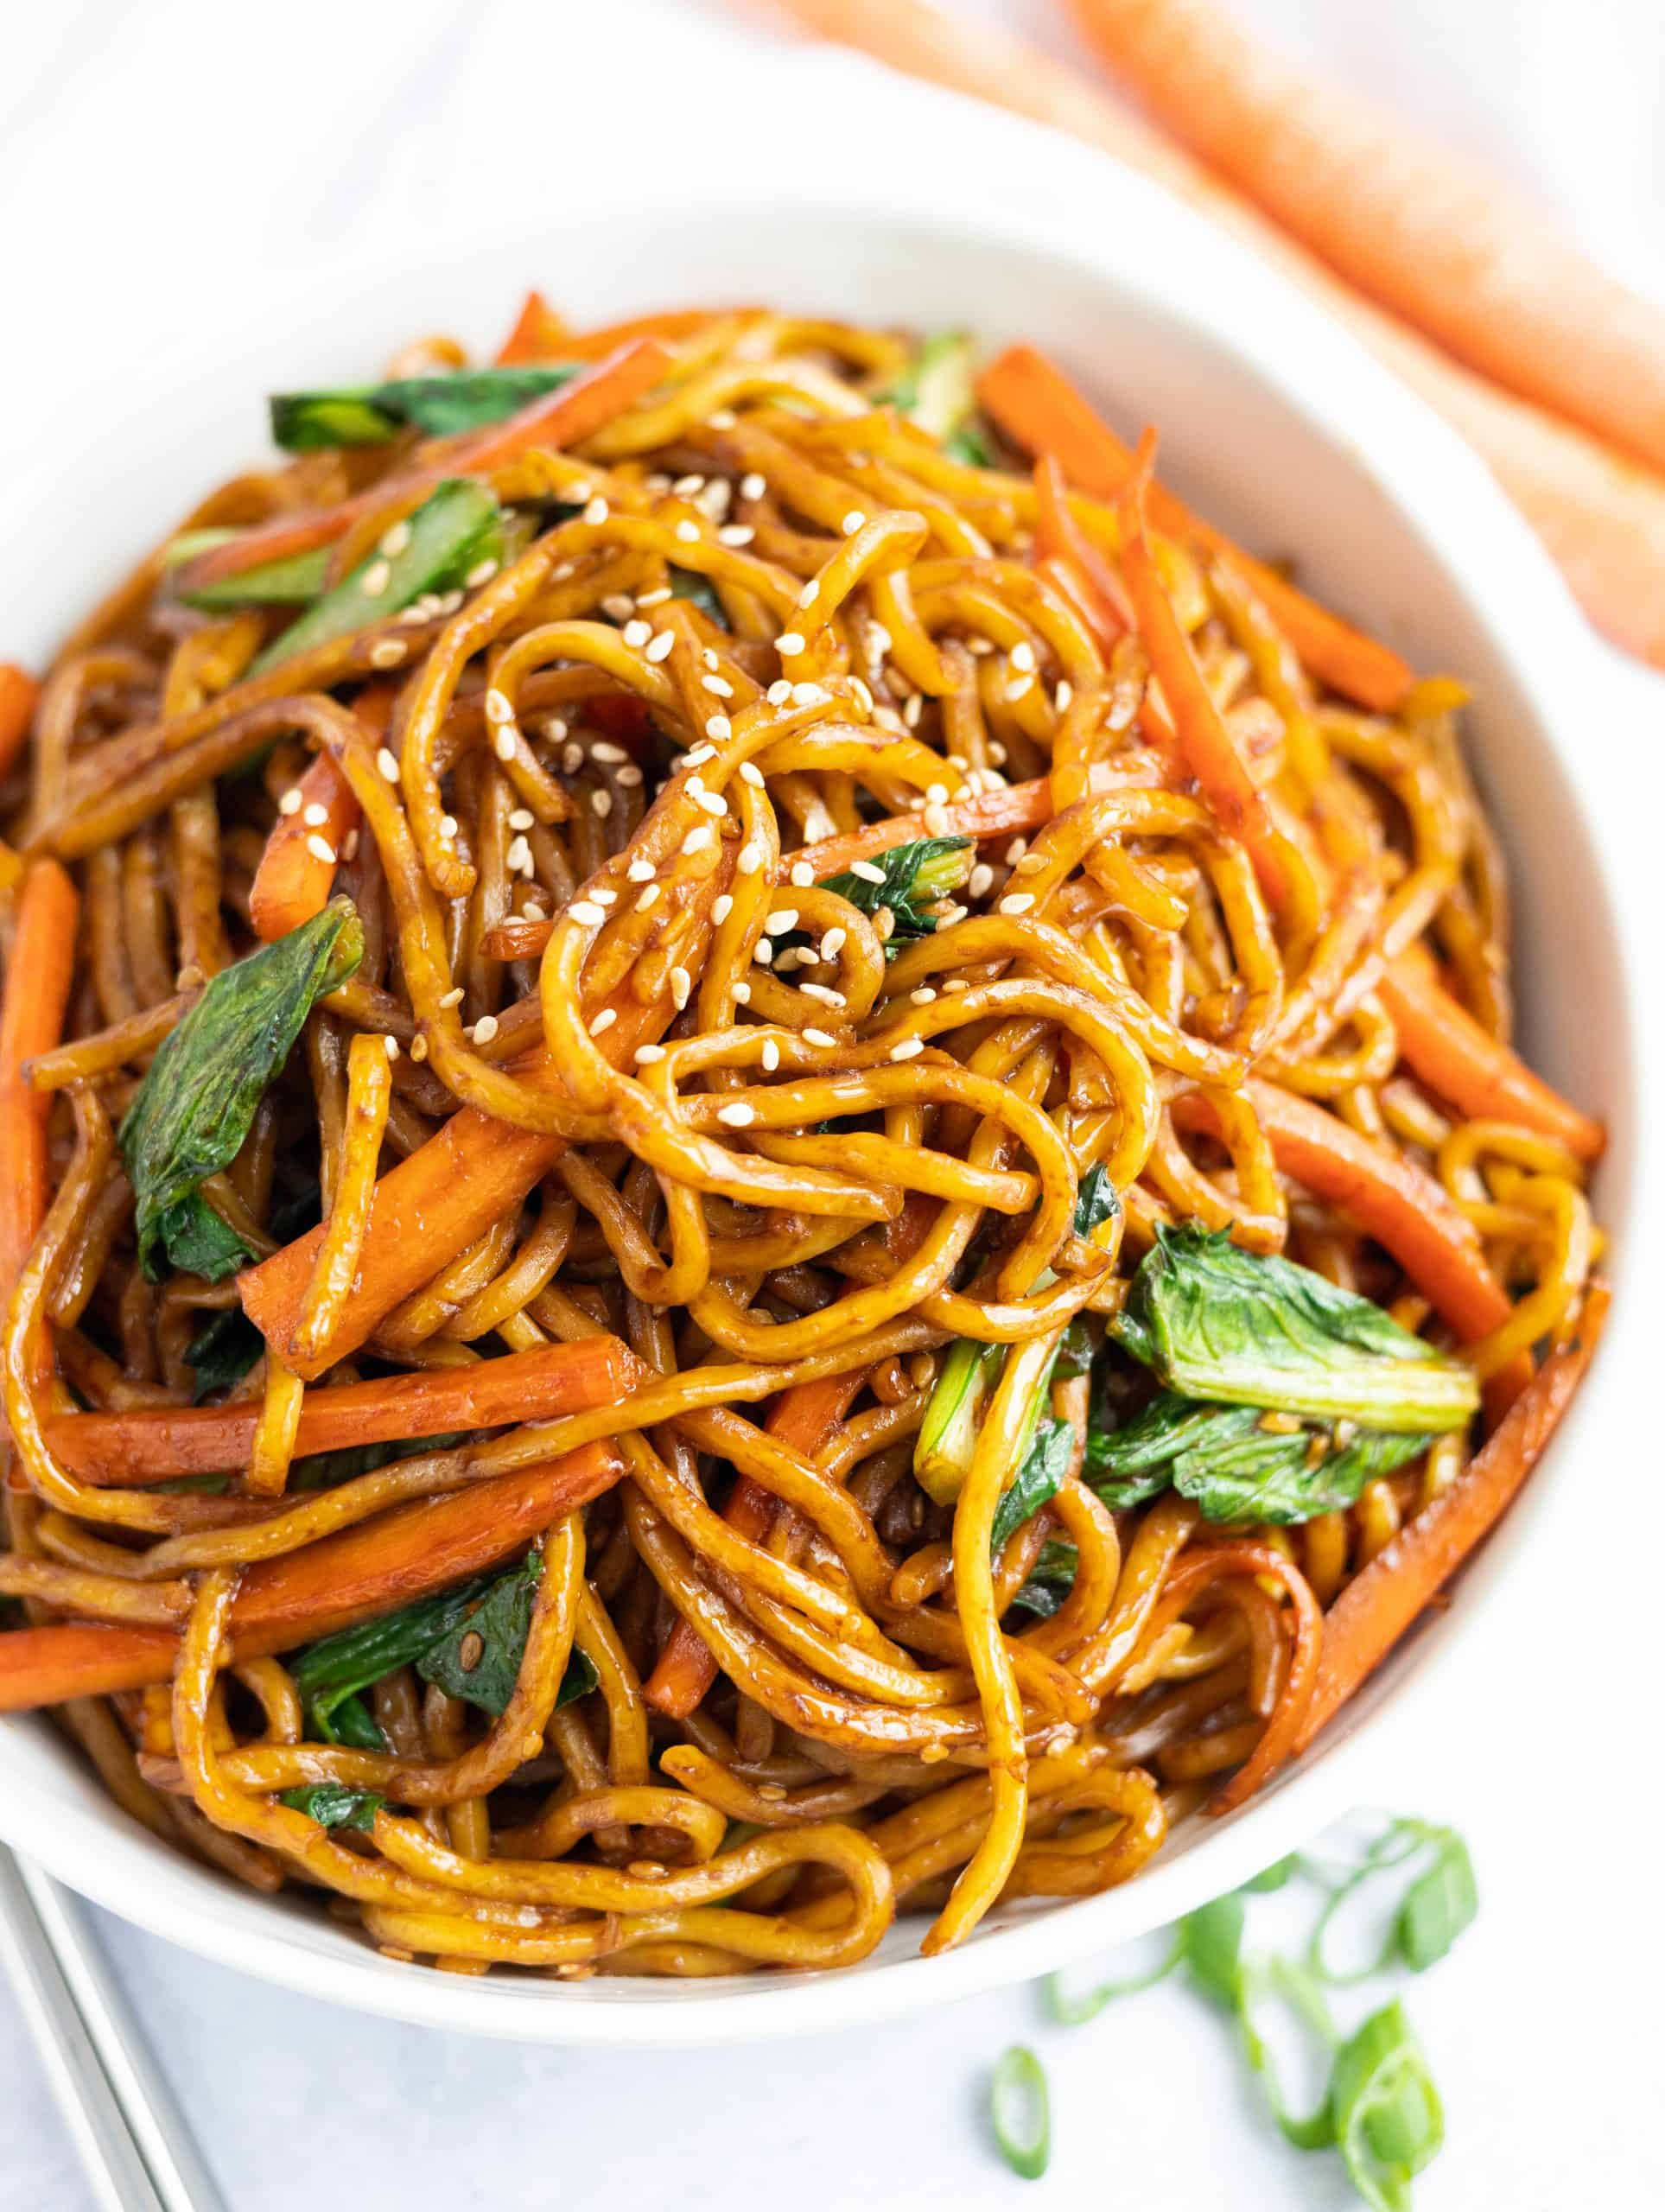 Vegan Asian Sesame Noodles